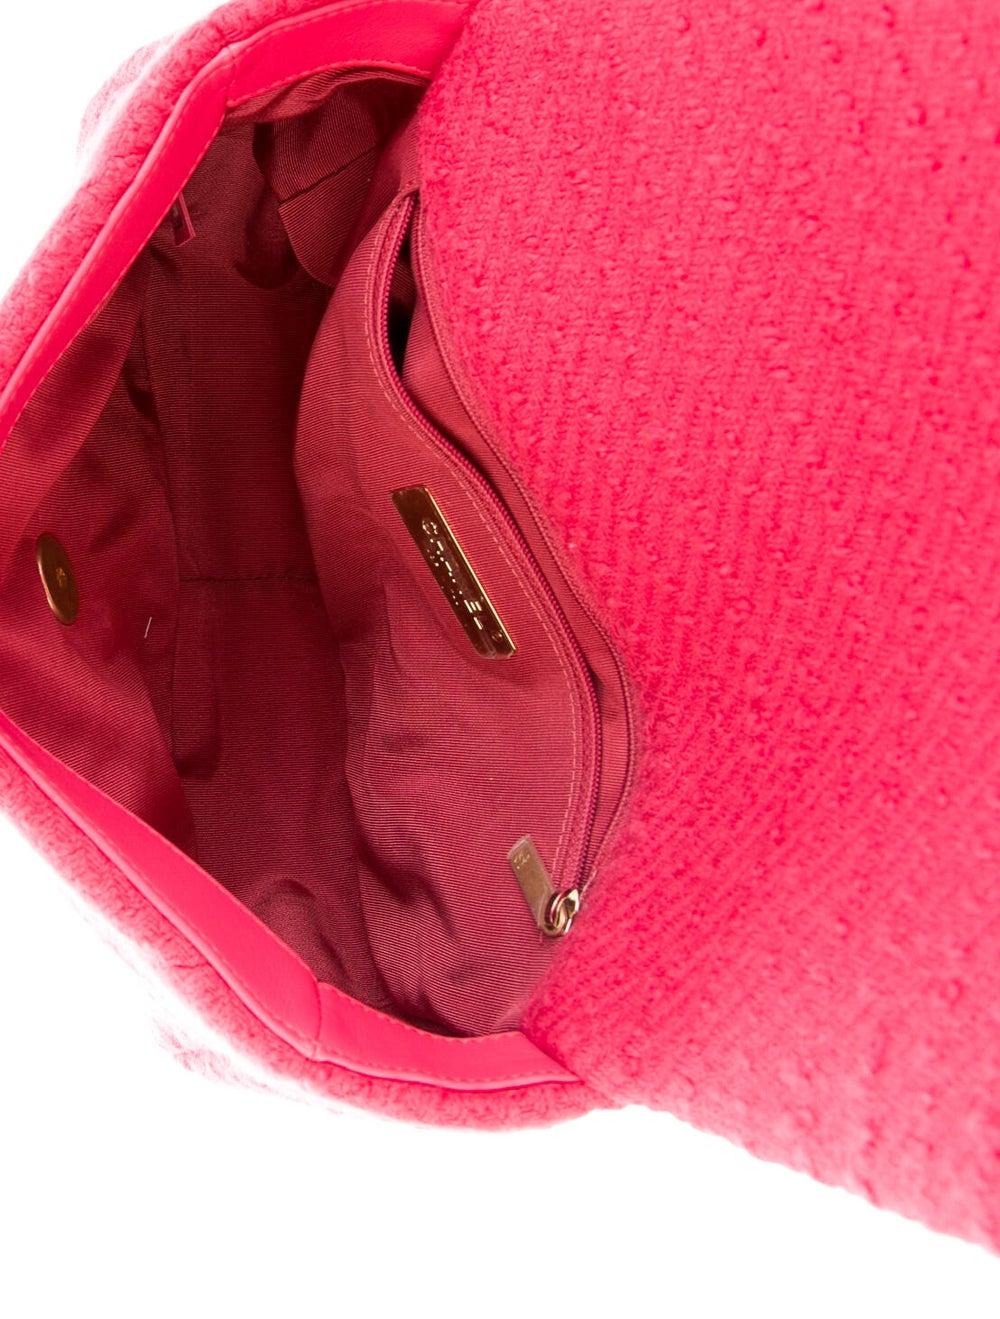 Chanel 2020 Medium Tweed 19 Bag Pink - image 5